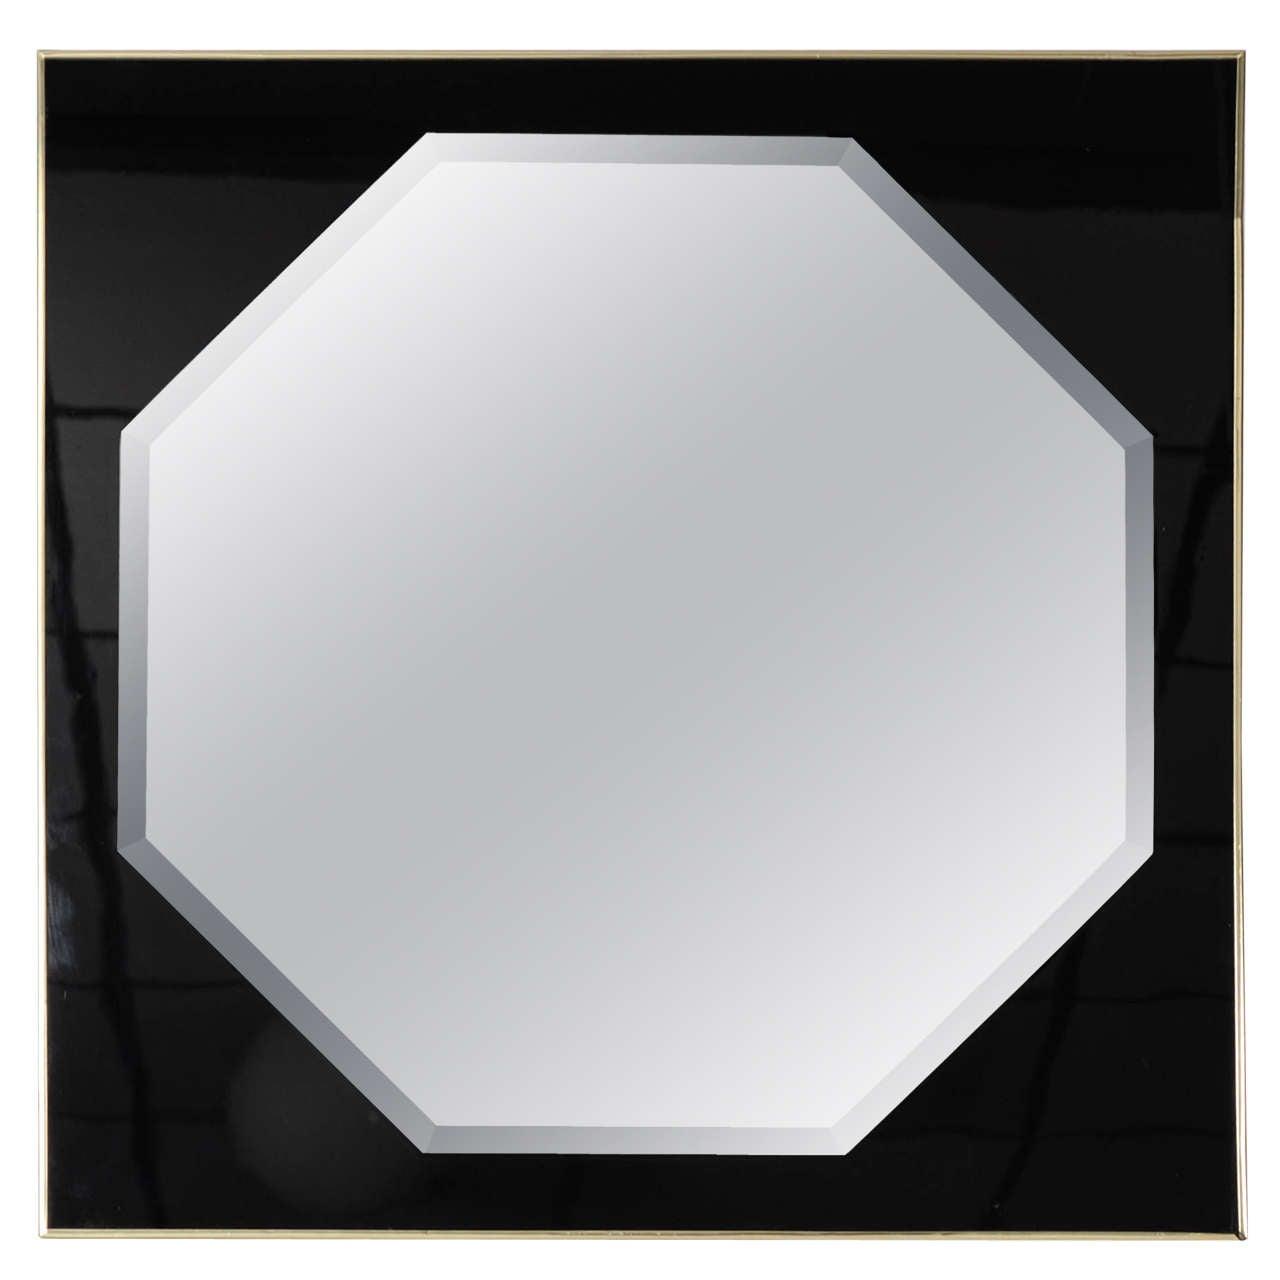 Octagonal Club Mirror in Black and Brass Frame